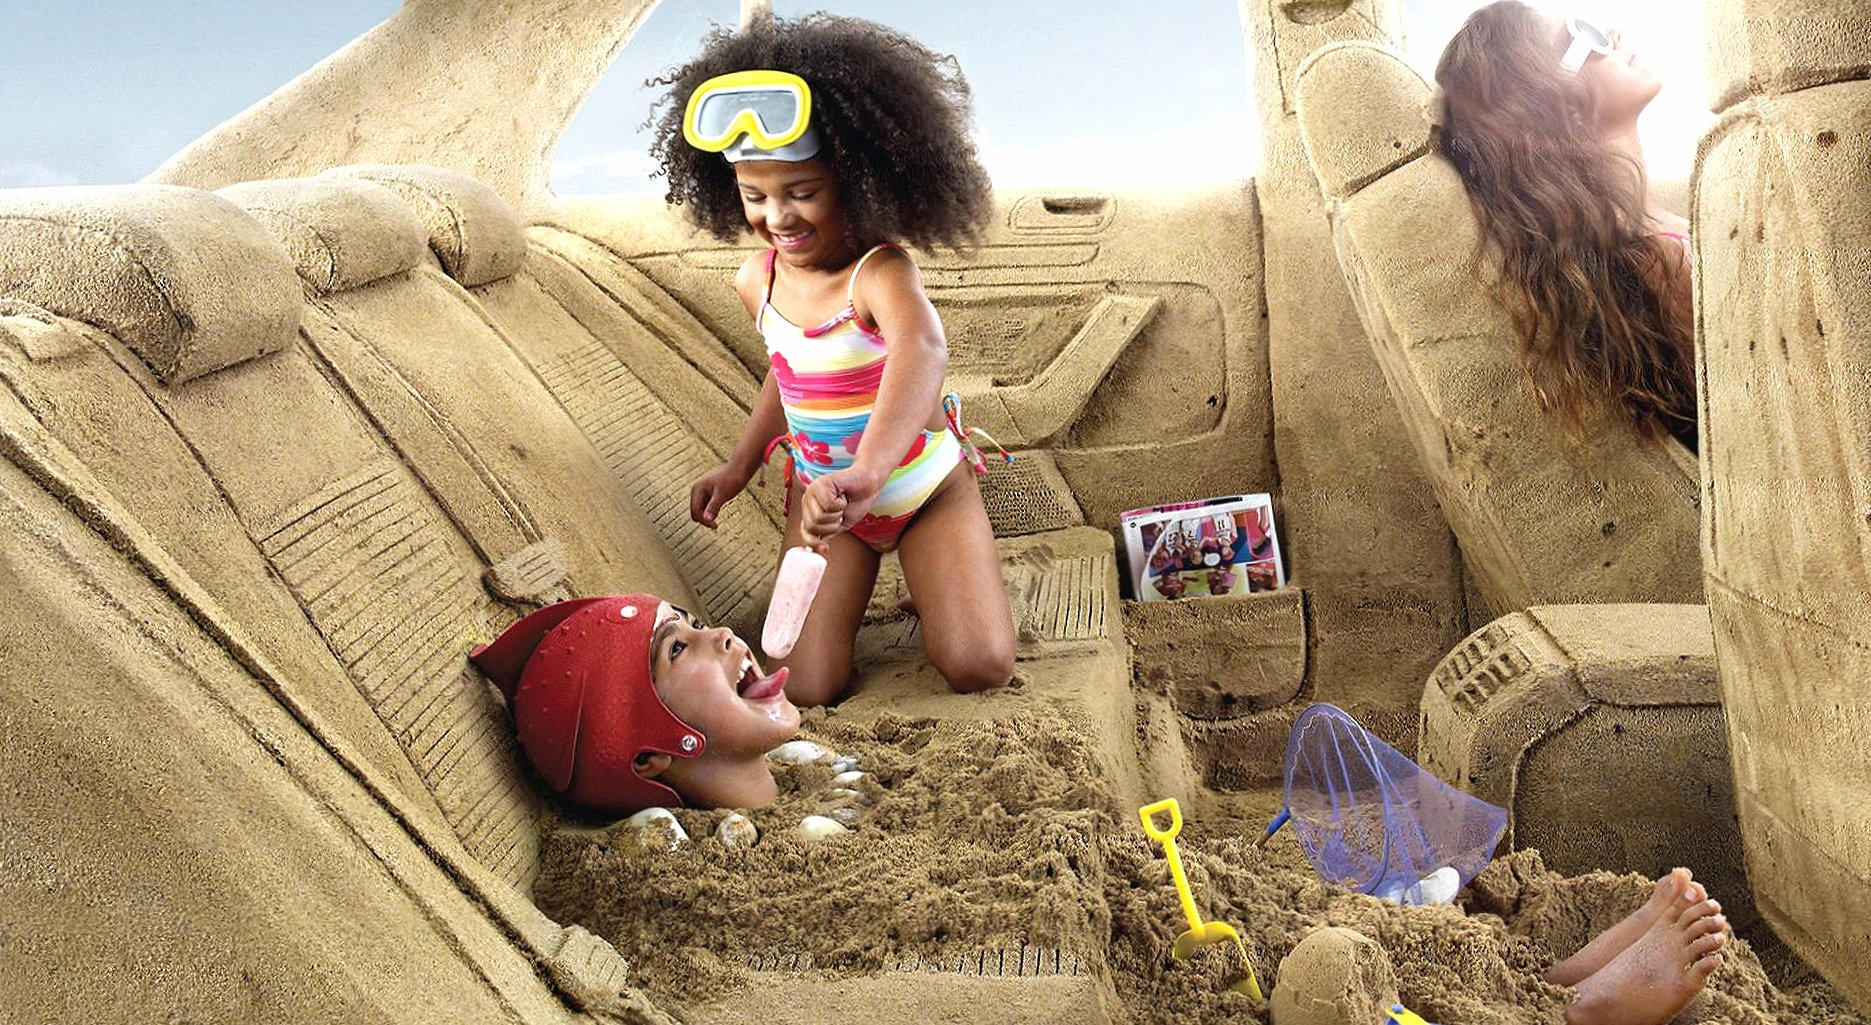 Sand car beach childrens digital wallpapers HD quality